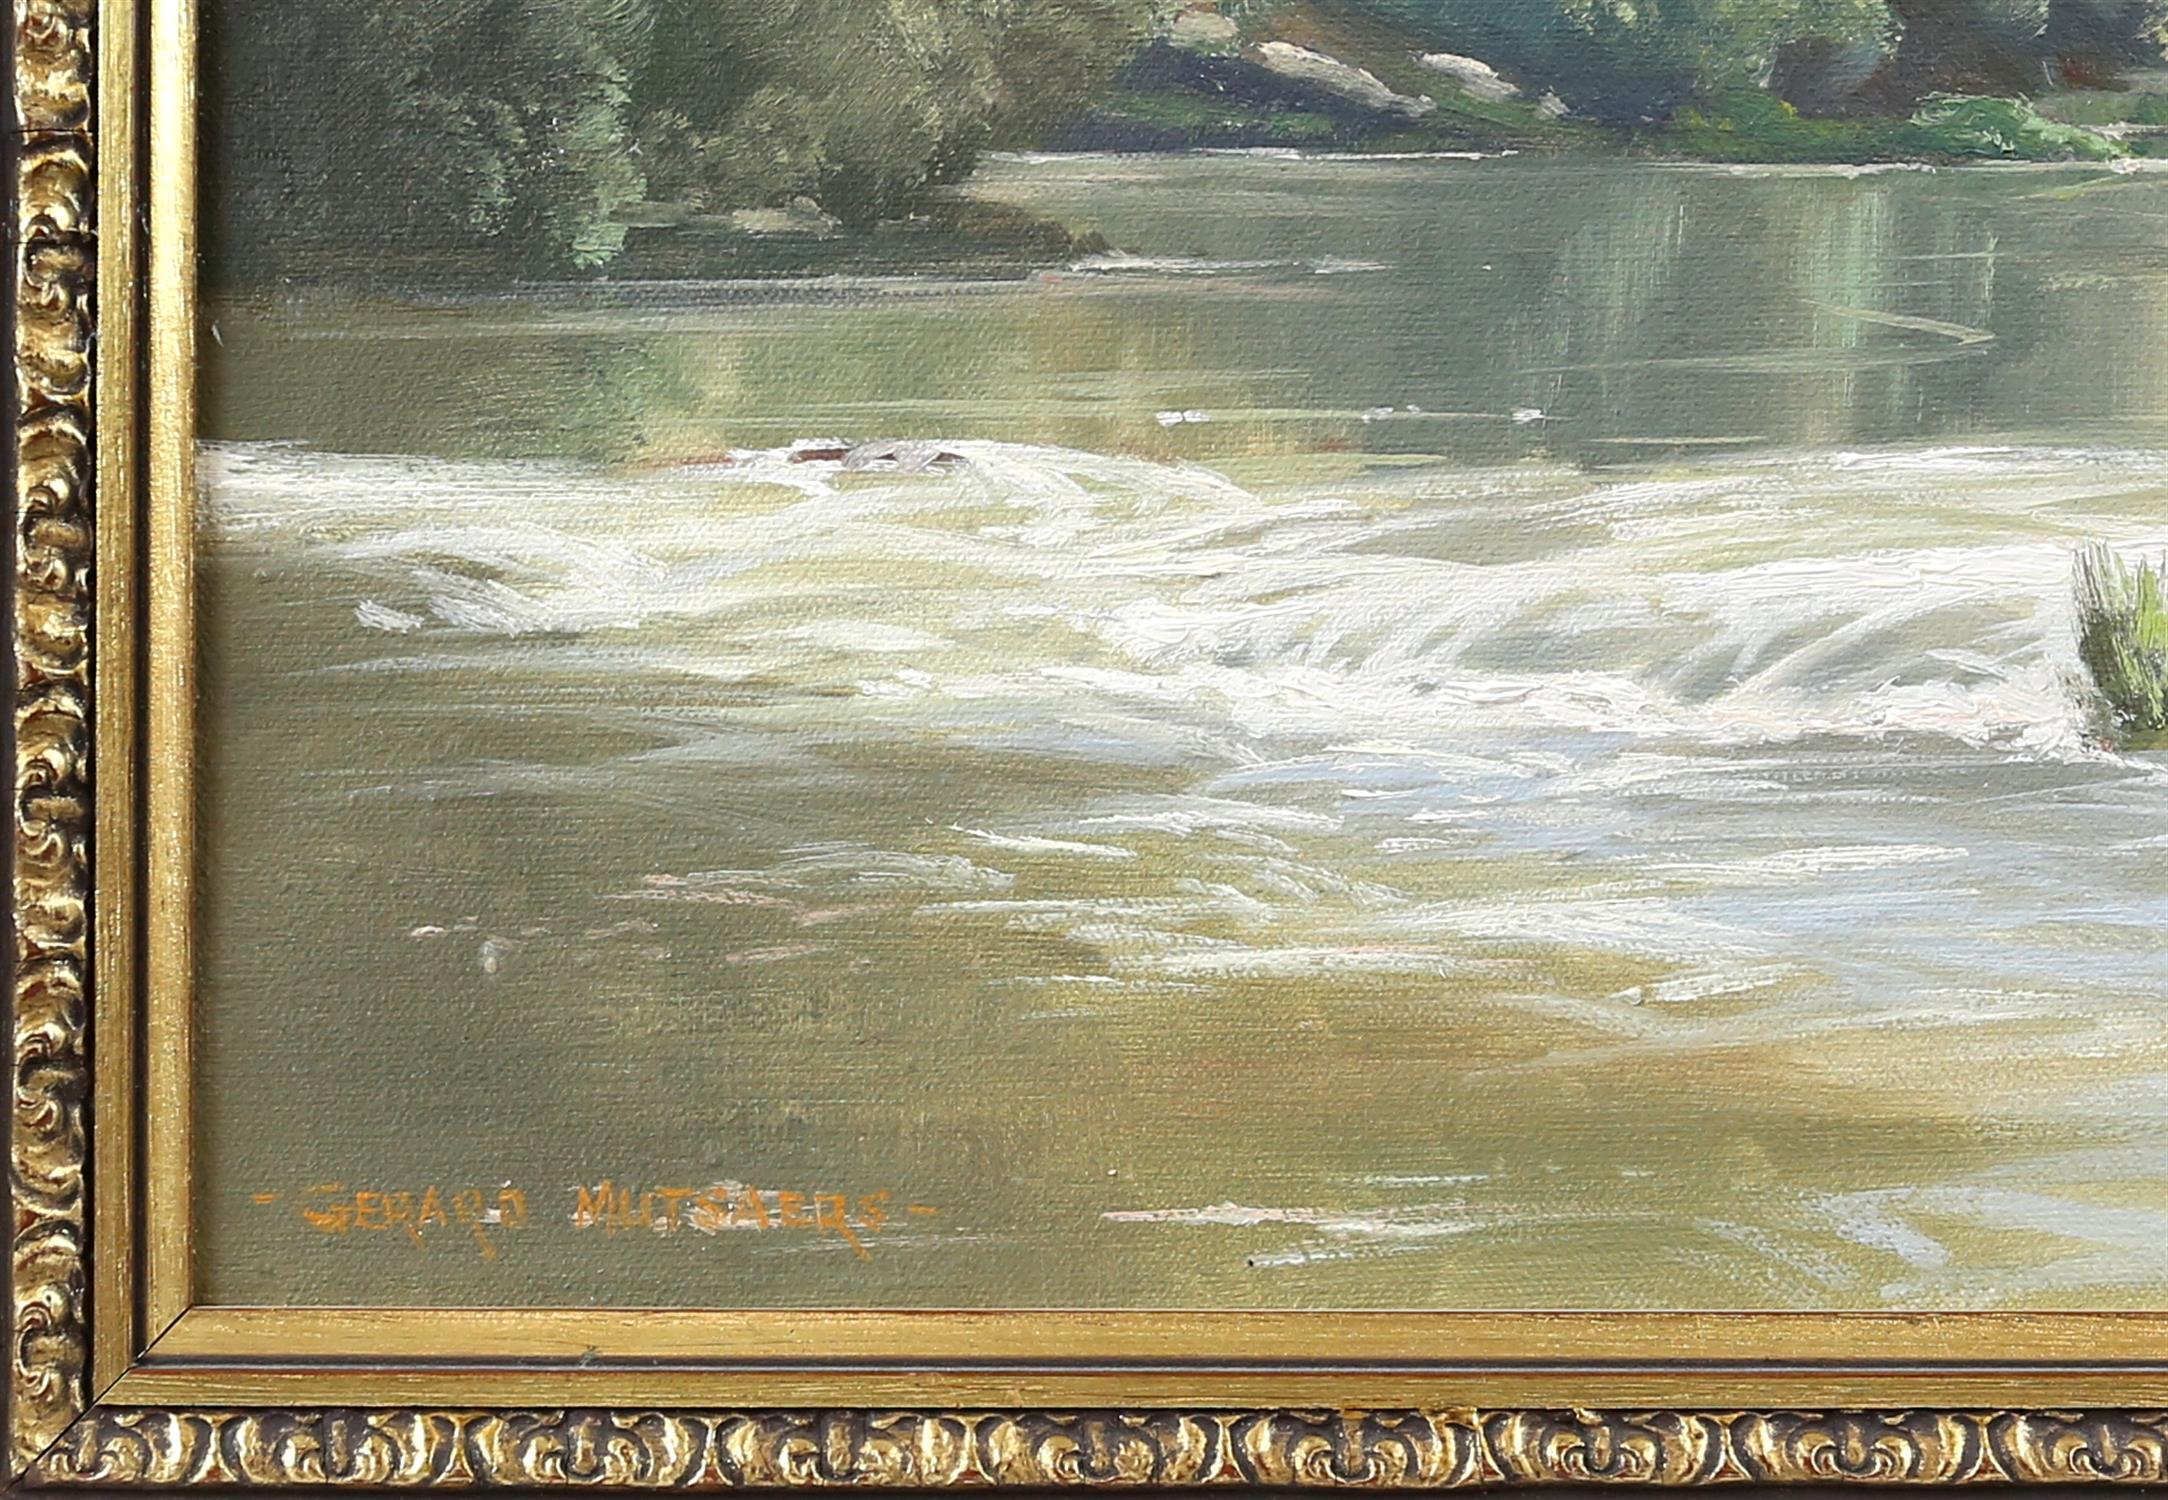 Gerard Mutsaers (Australian b. 1947), 'Morning Light, Yarra River, Warburton', signed, oil on board, - Image 4 of 4